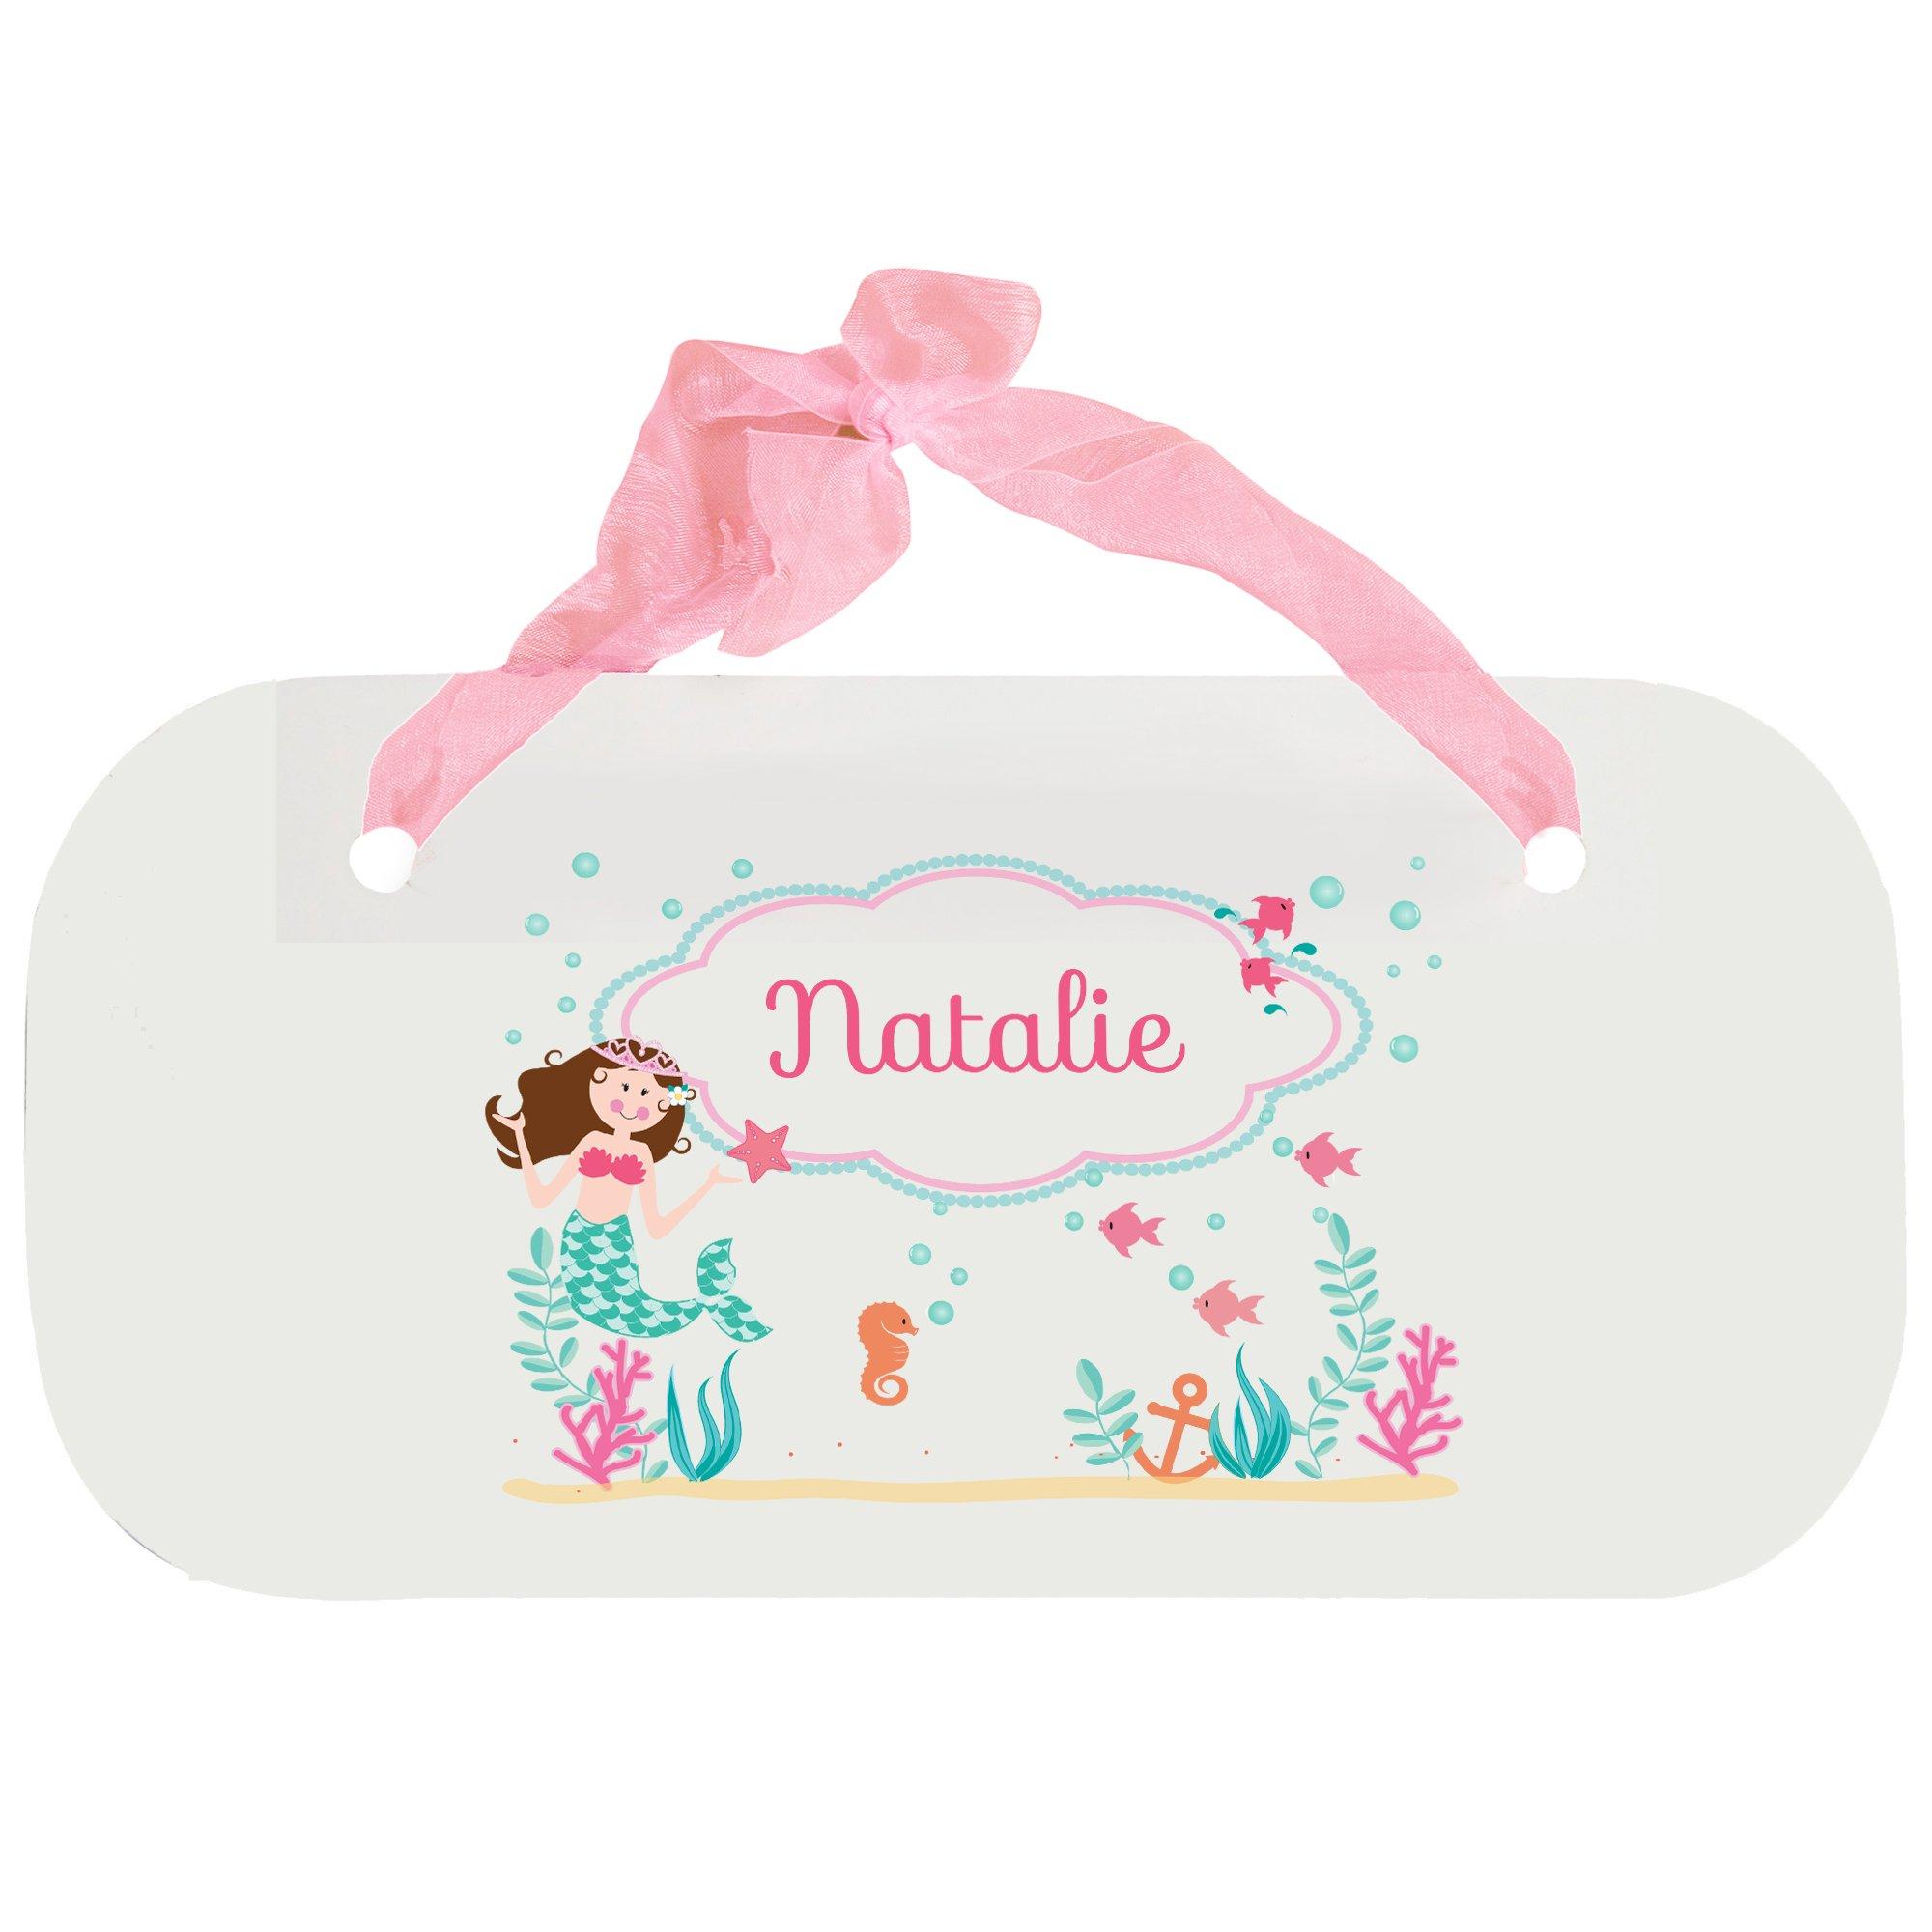 Personalized Brunette Mermaid Princess Nursery Door Hanger Plaque with pink ribbon